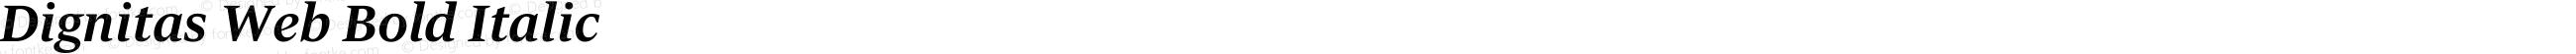 Dignitas Web Bold Italic